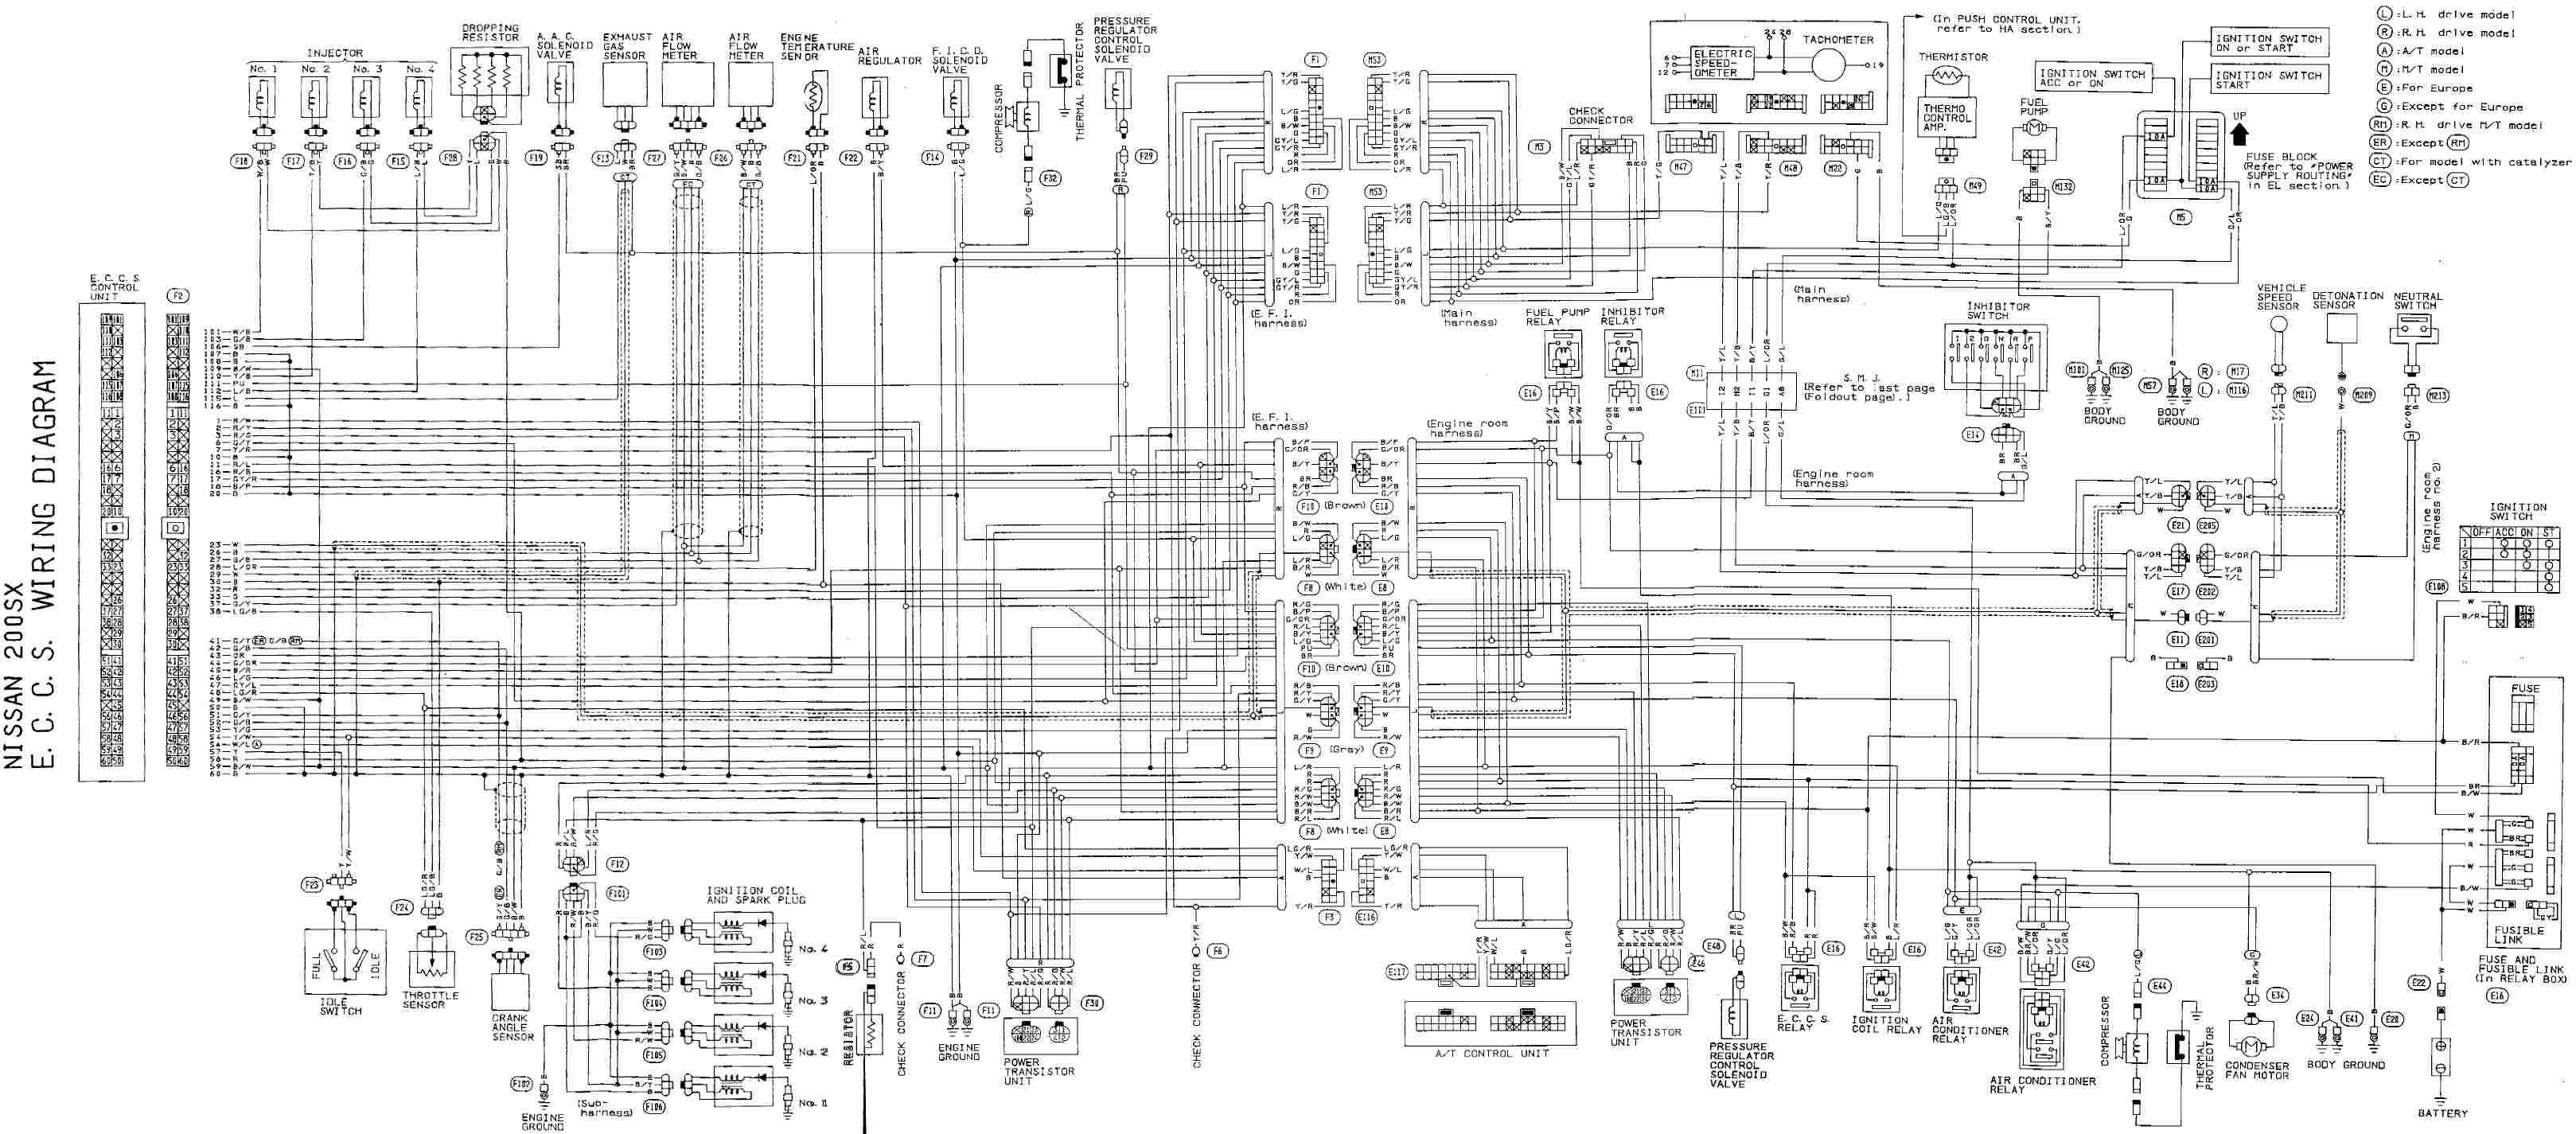 2008 Nissan Sentra Engine Diagram Wiring Diagram Sr20 Engine Plete Eccs Stunning Nissan Sentra Of 2008 Nissan Sentra Engine Diagram